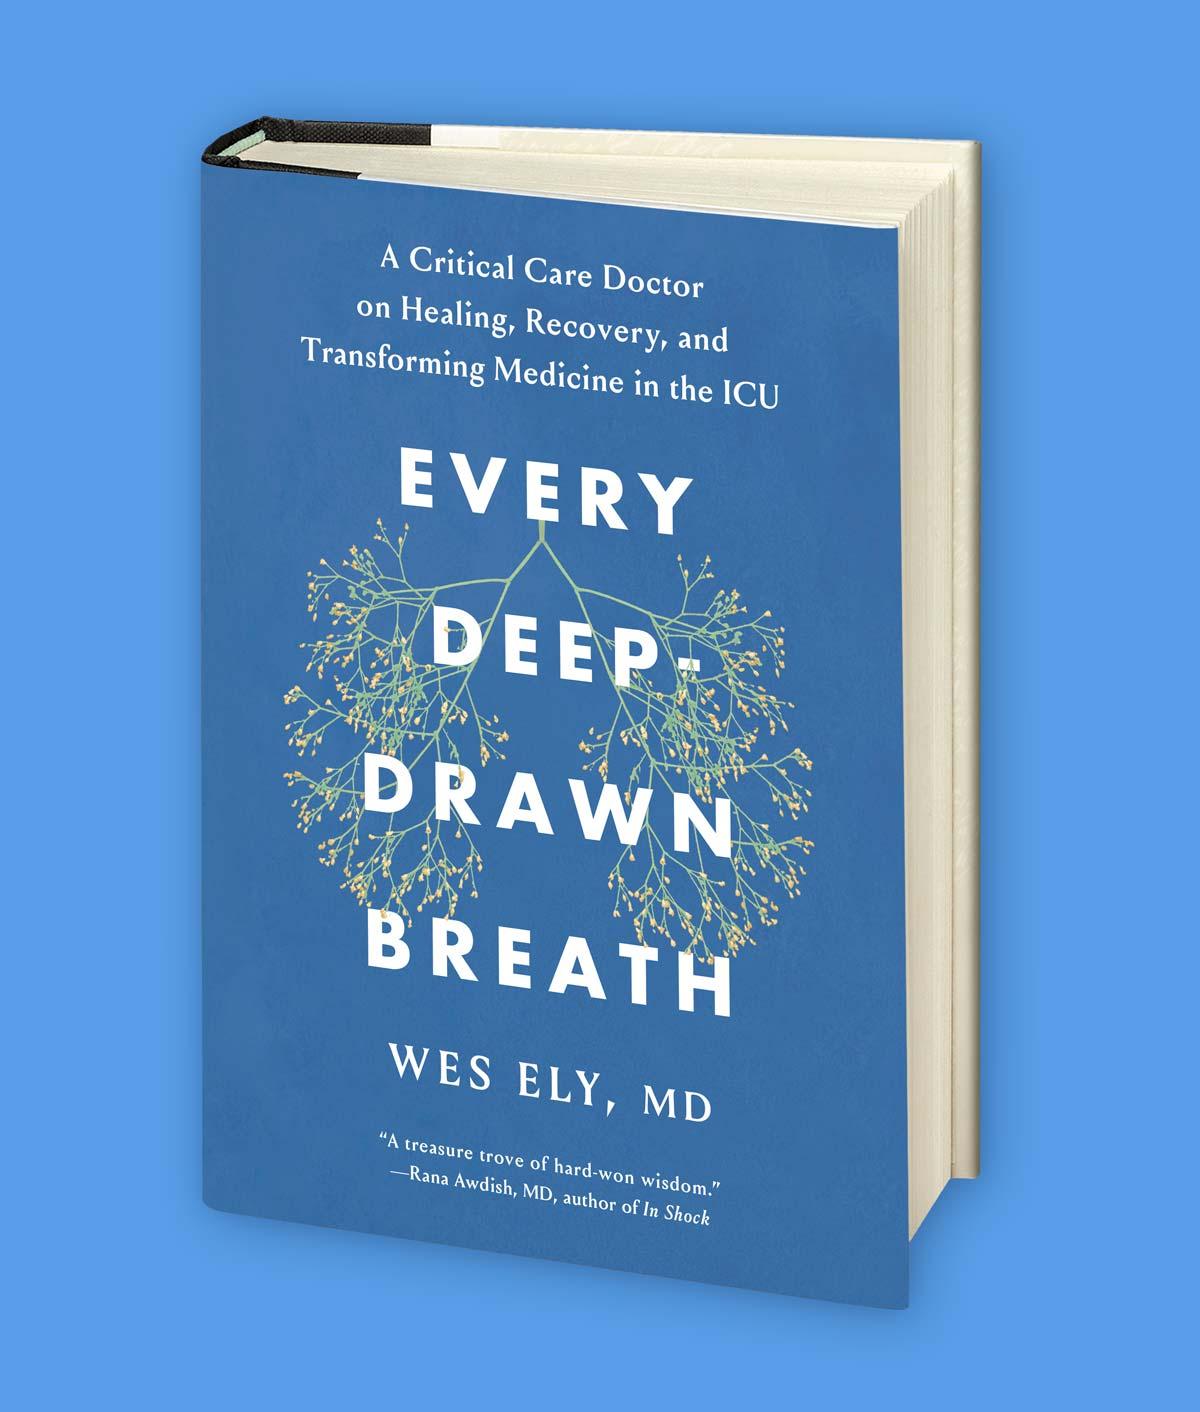 Every Deep Drawn Breath Book Cover